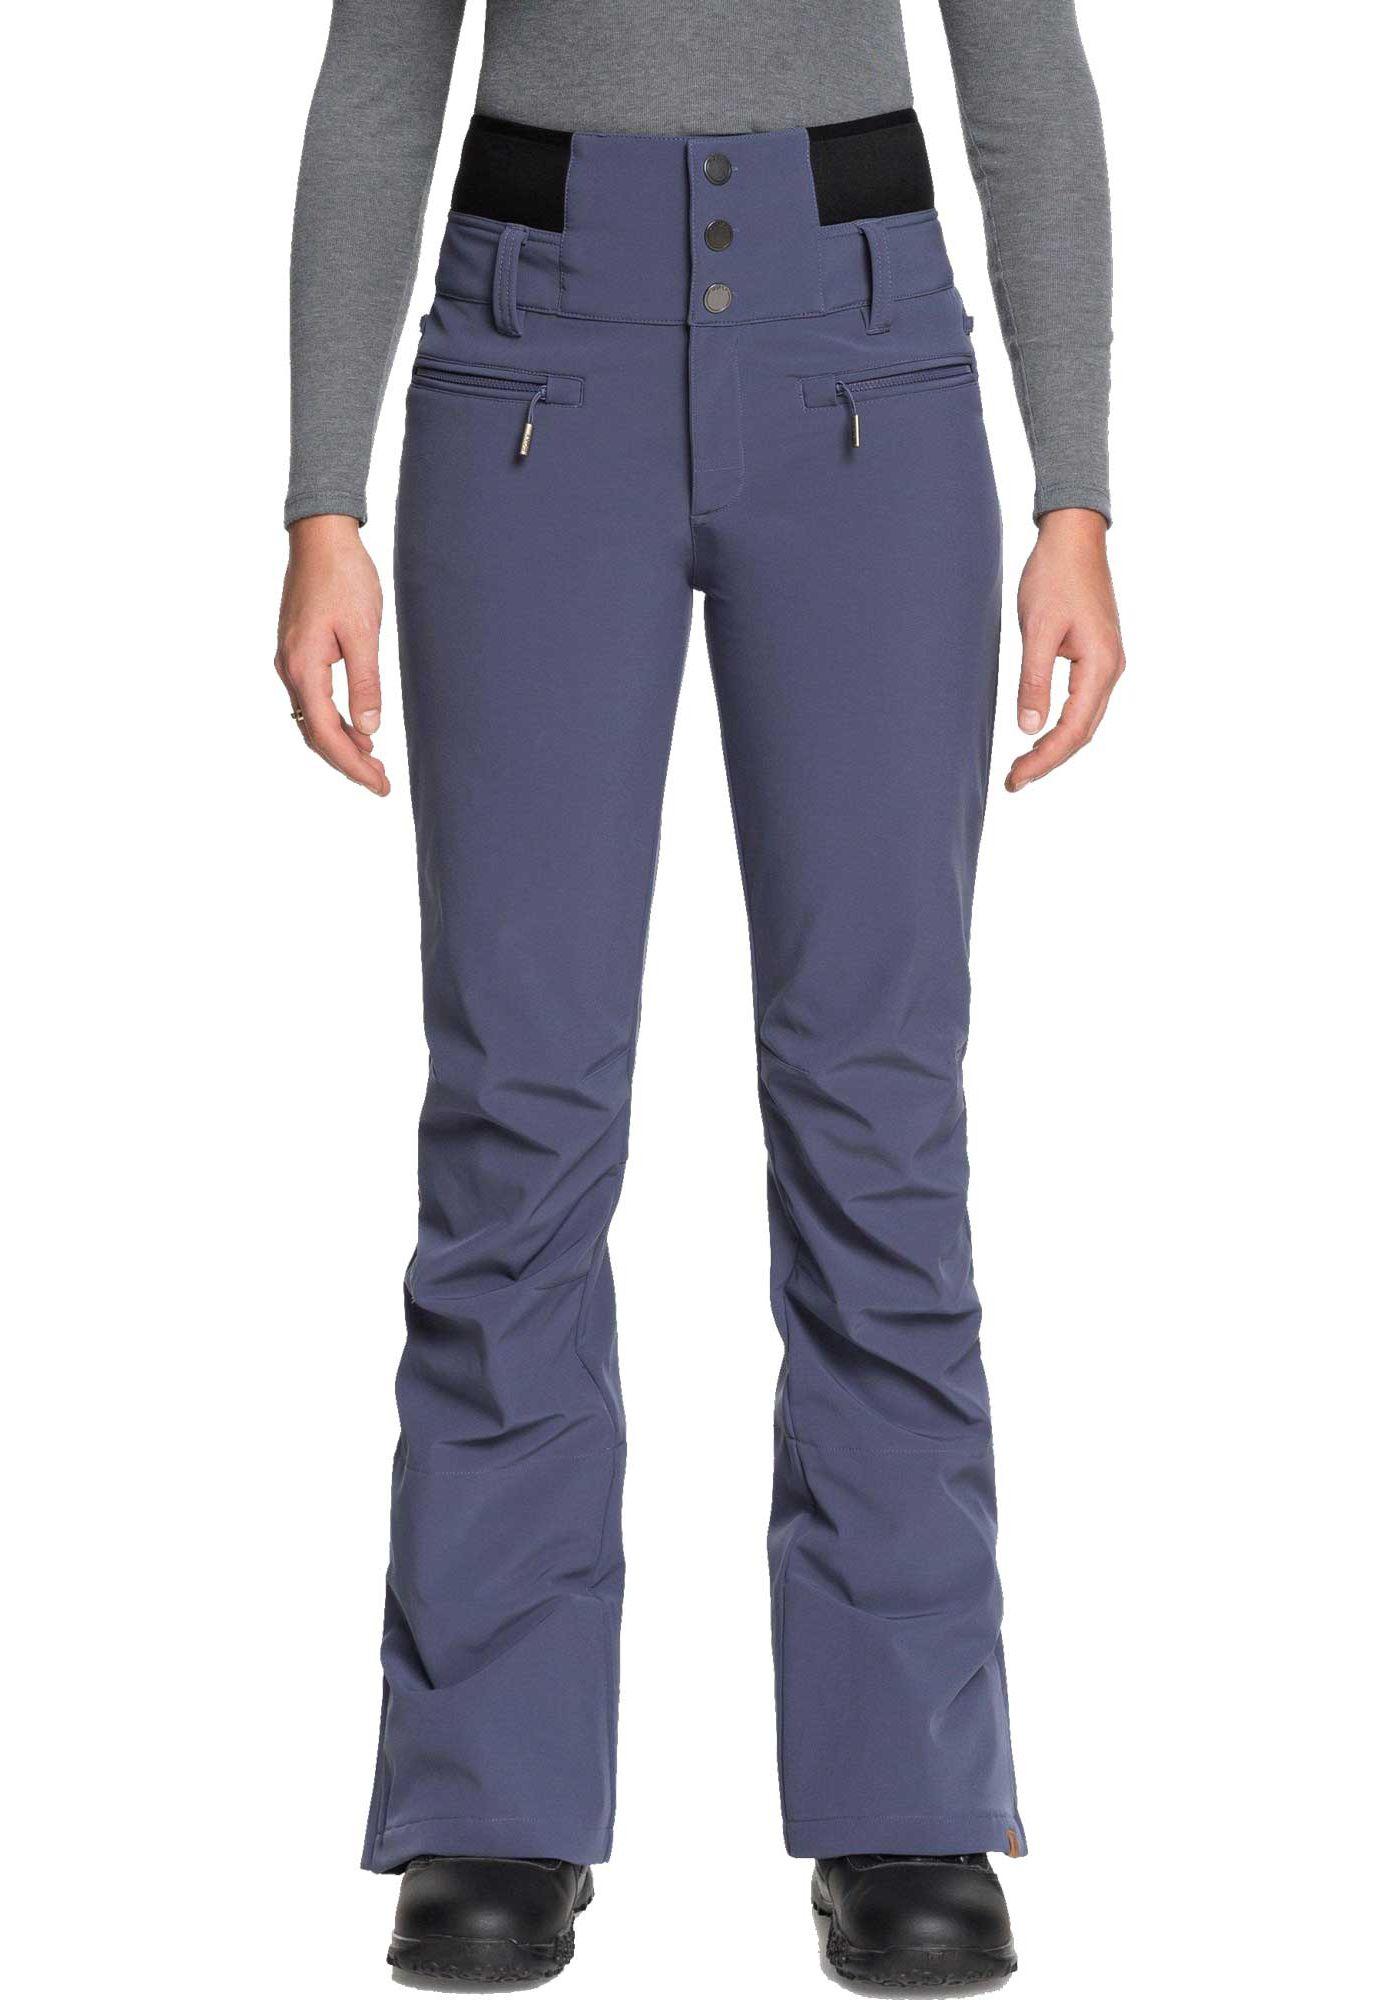 Roxy Women's Rising High Snow Pants